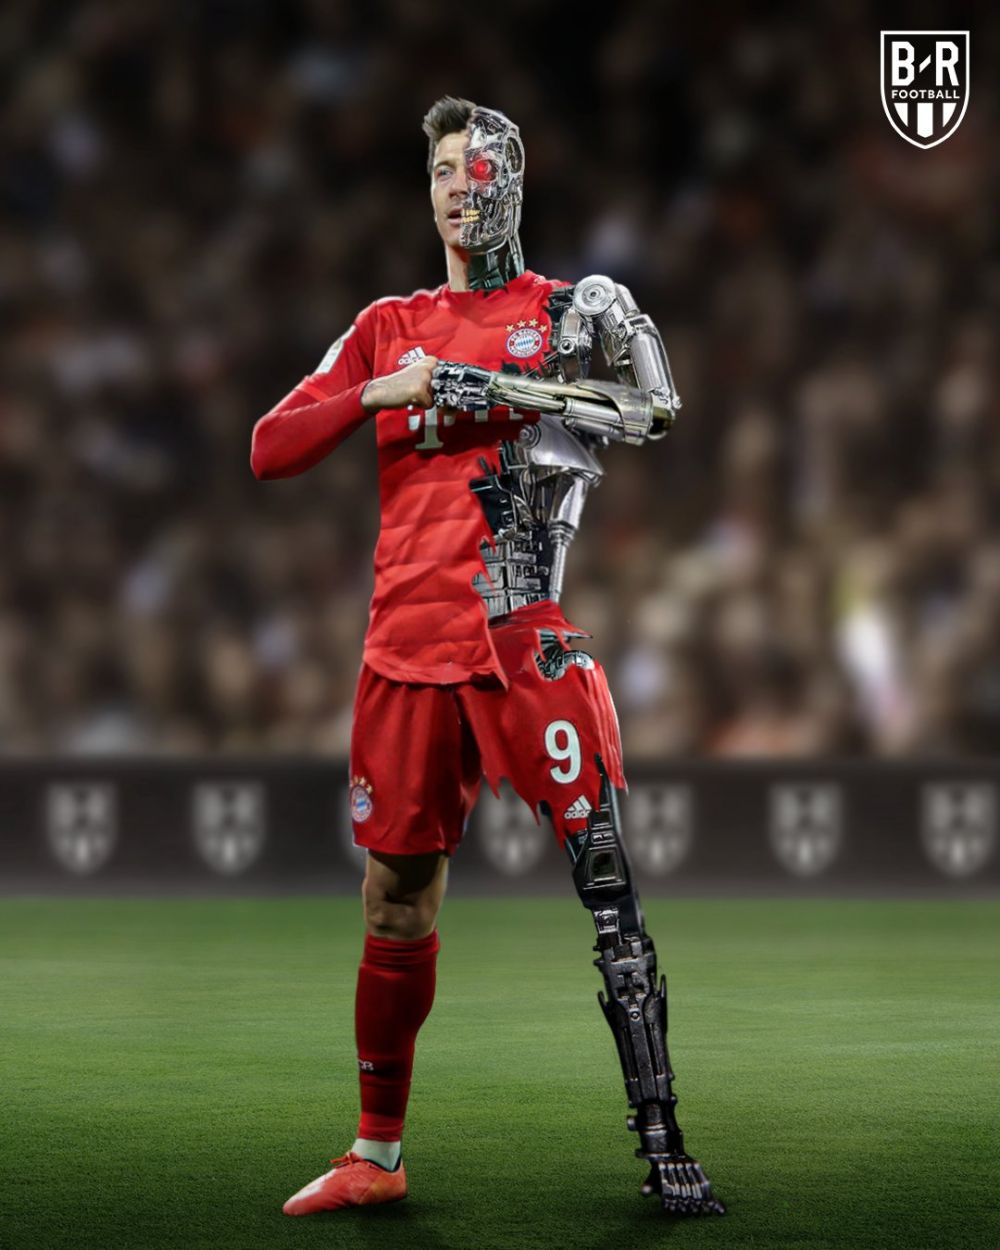 Sa-l opreasca cineva daca poate! Lewandowski e un MONSTRU: 10 goluri in 5 etape! Cu Eintracht a reusit hattrick perfect: a marcat cu stangul, cu dreptul si cu capul